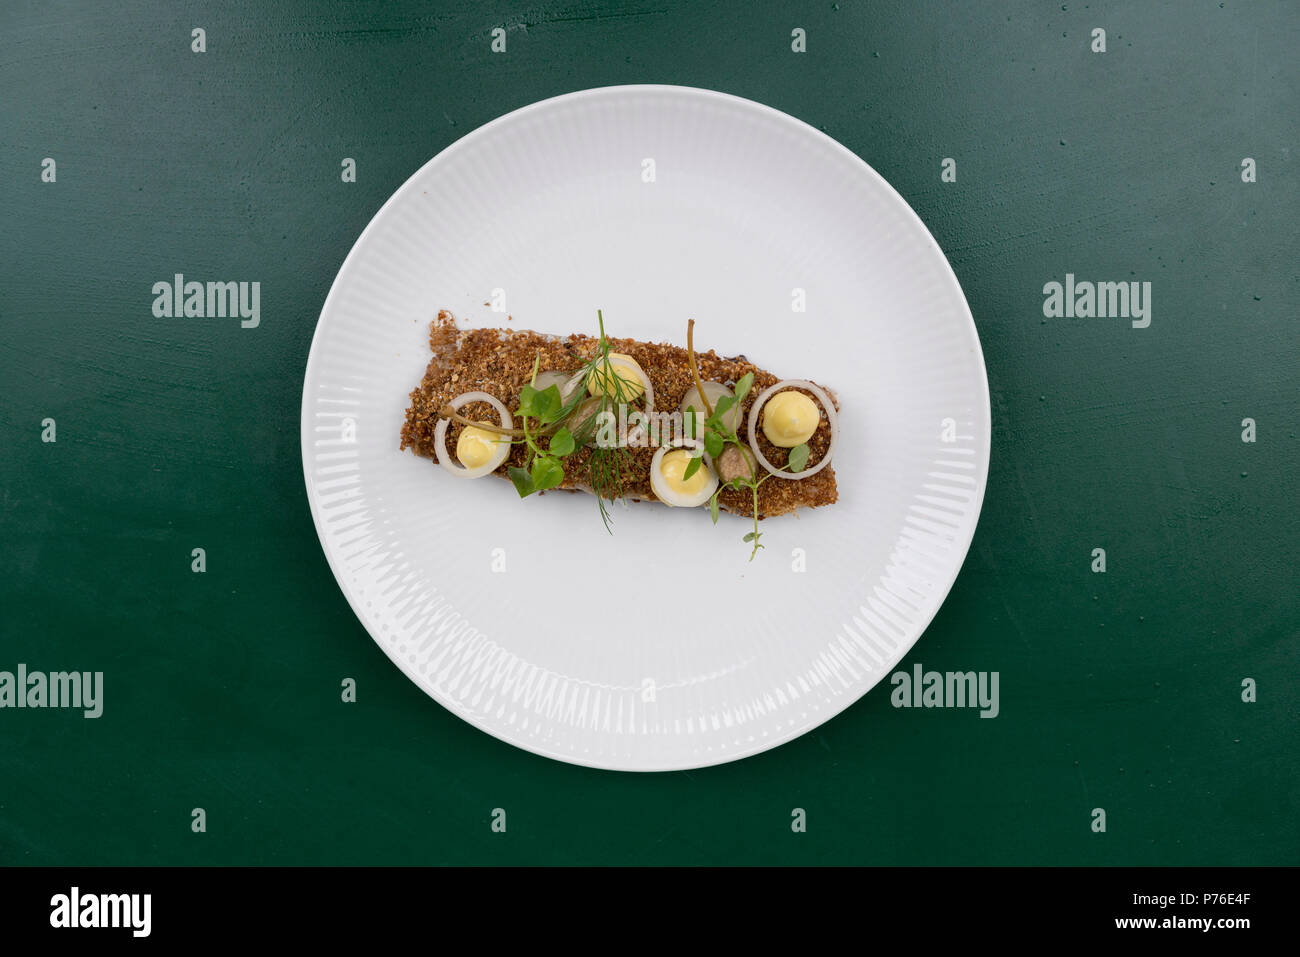 Palaegade restaurant copenhagen - Stock Image